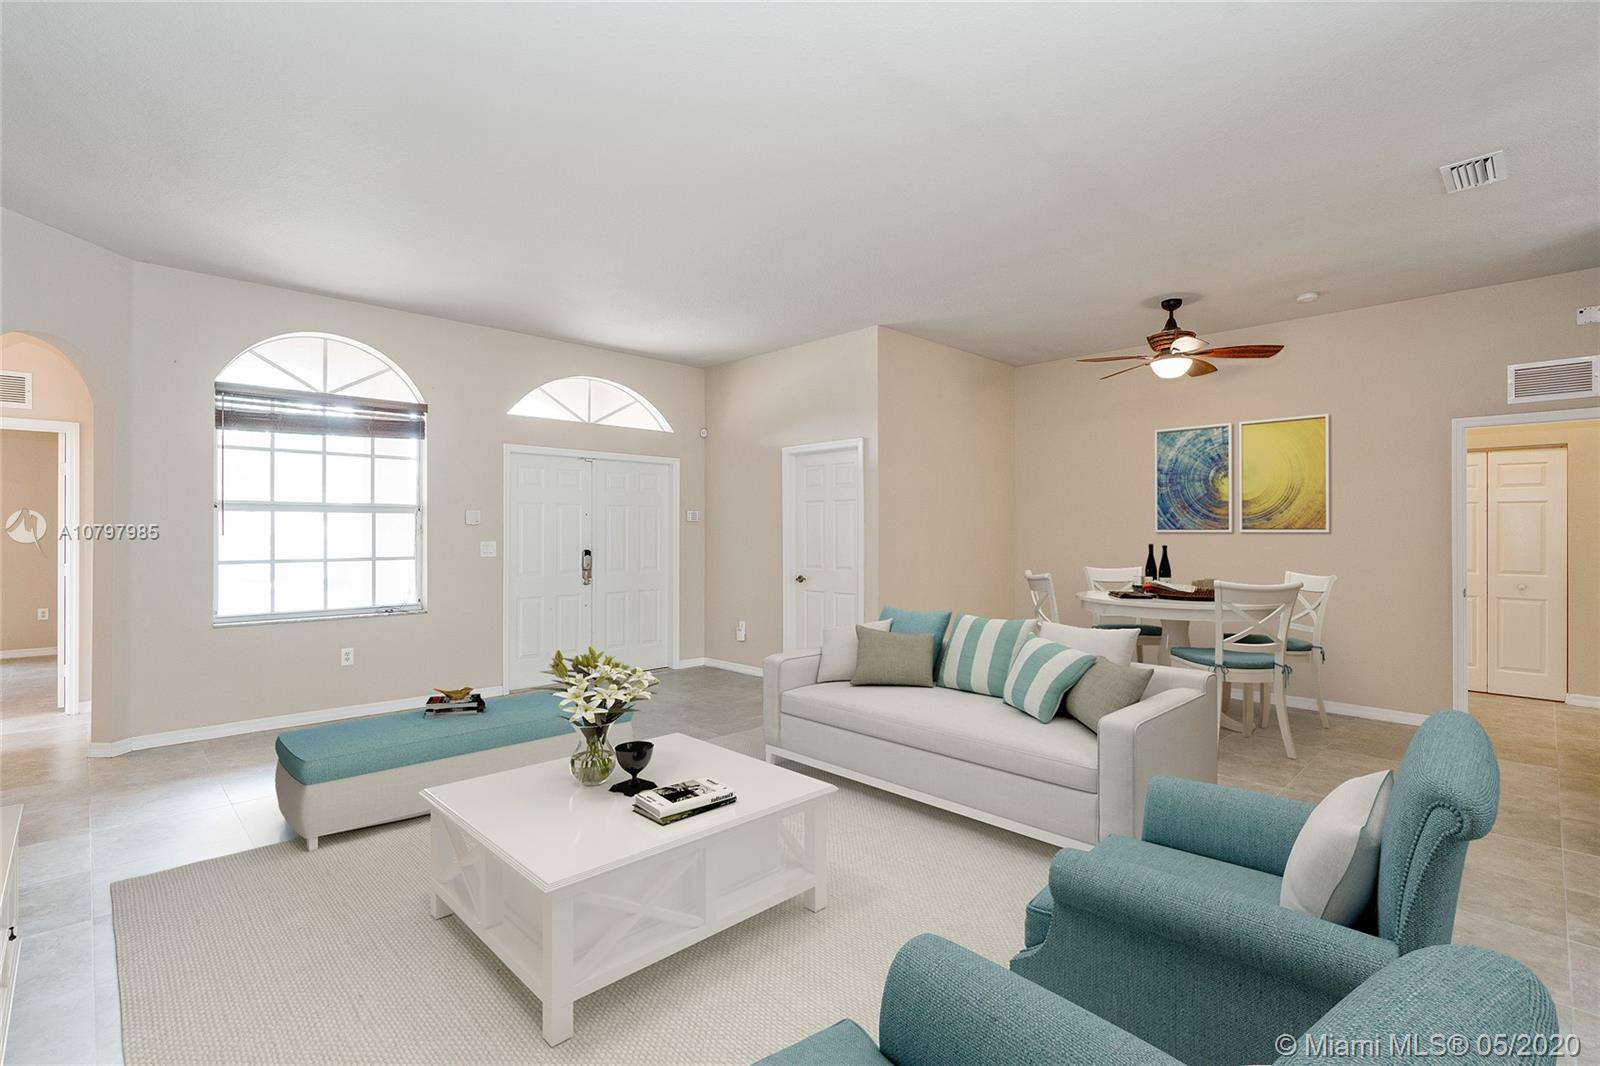 1850 SE 20th Ave, Homestead, FL 33035 - Homestead, FL real estate listing